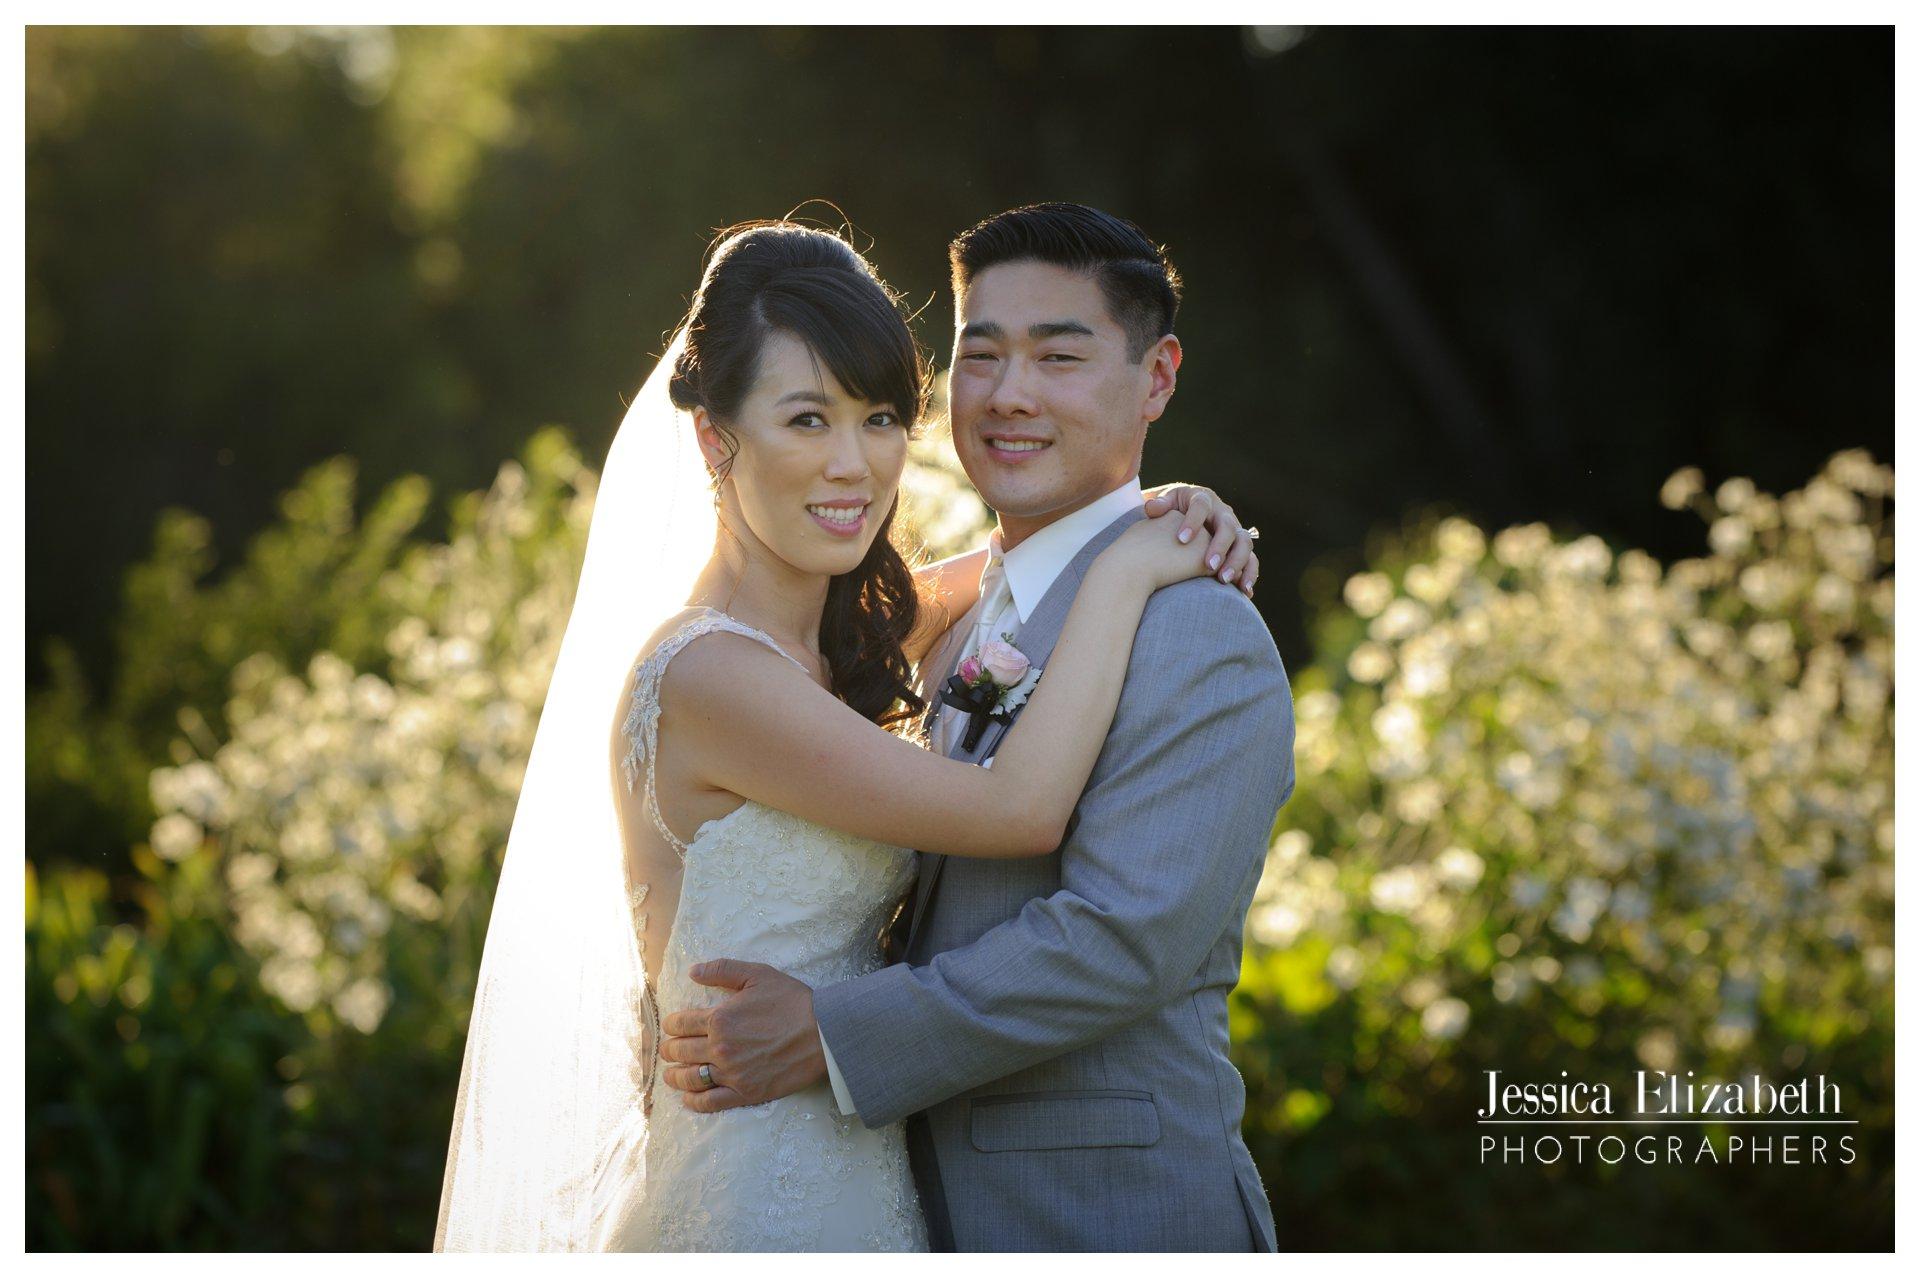 27-South Coast Botanic Garden Palos Verdes Wedding Photography by Jessica Elizabeth